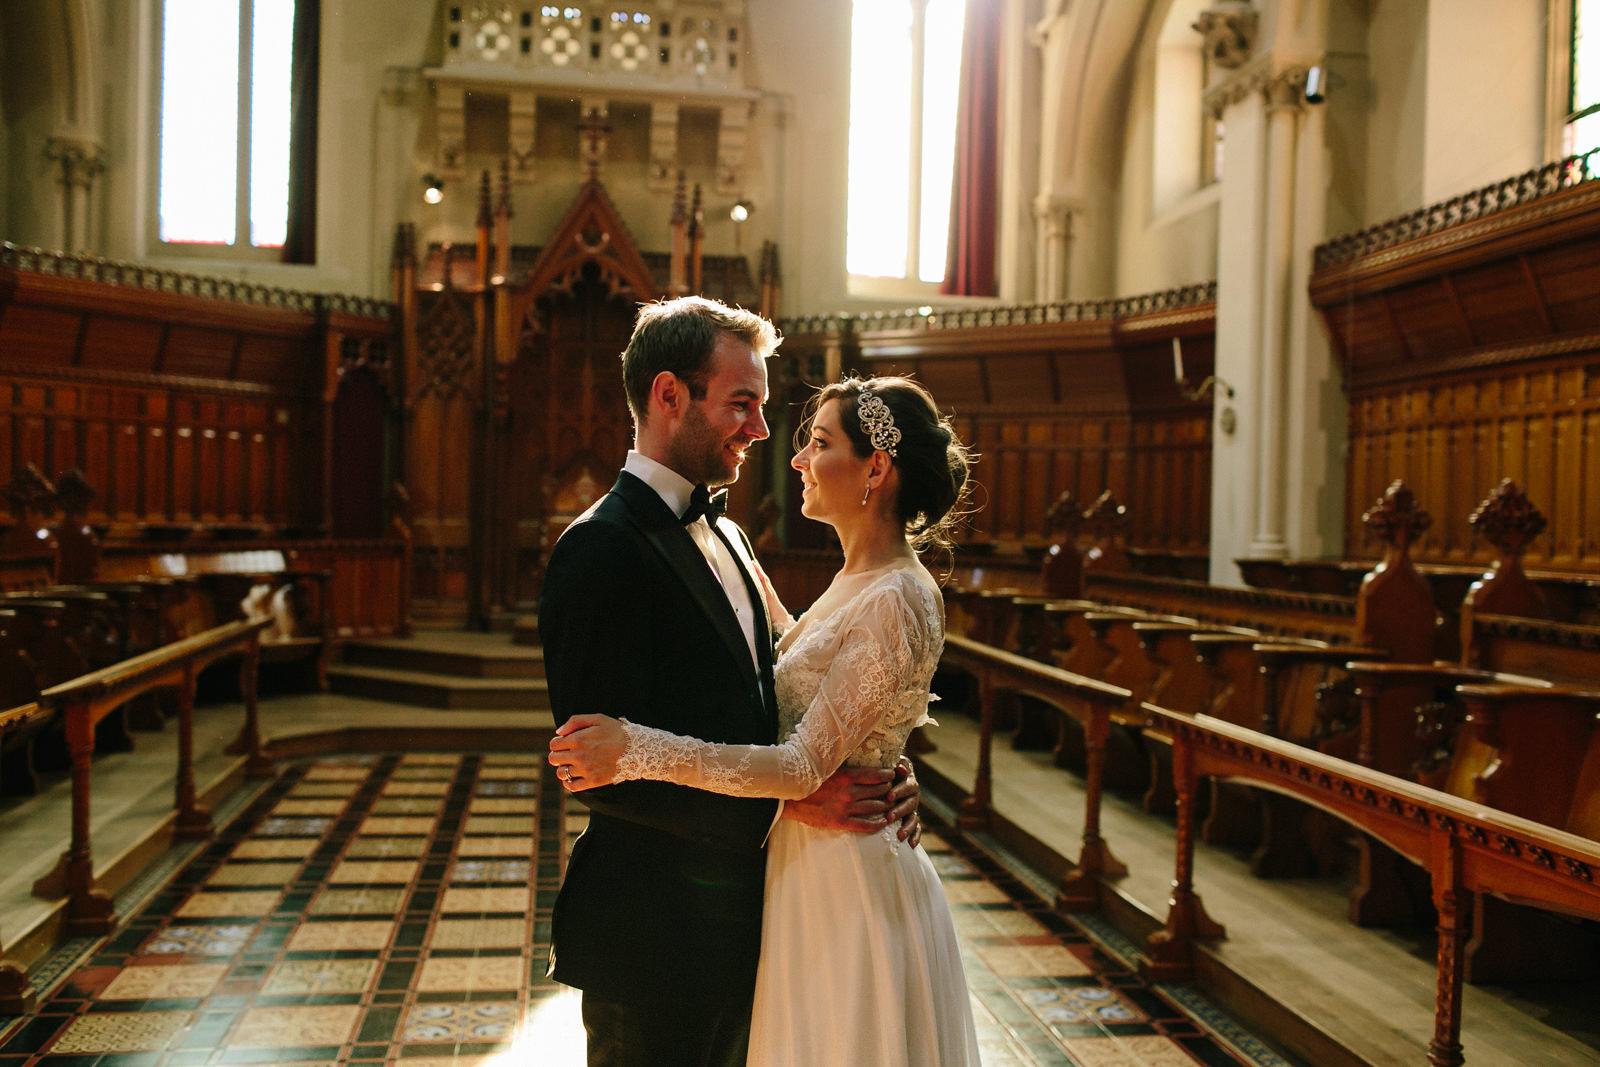 Stanbrooke Abbey Wedding Photographer-322477.jpg